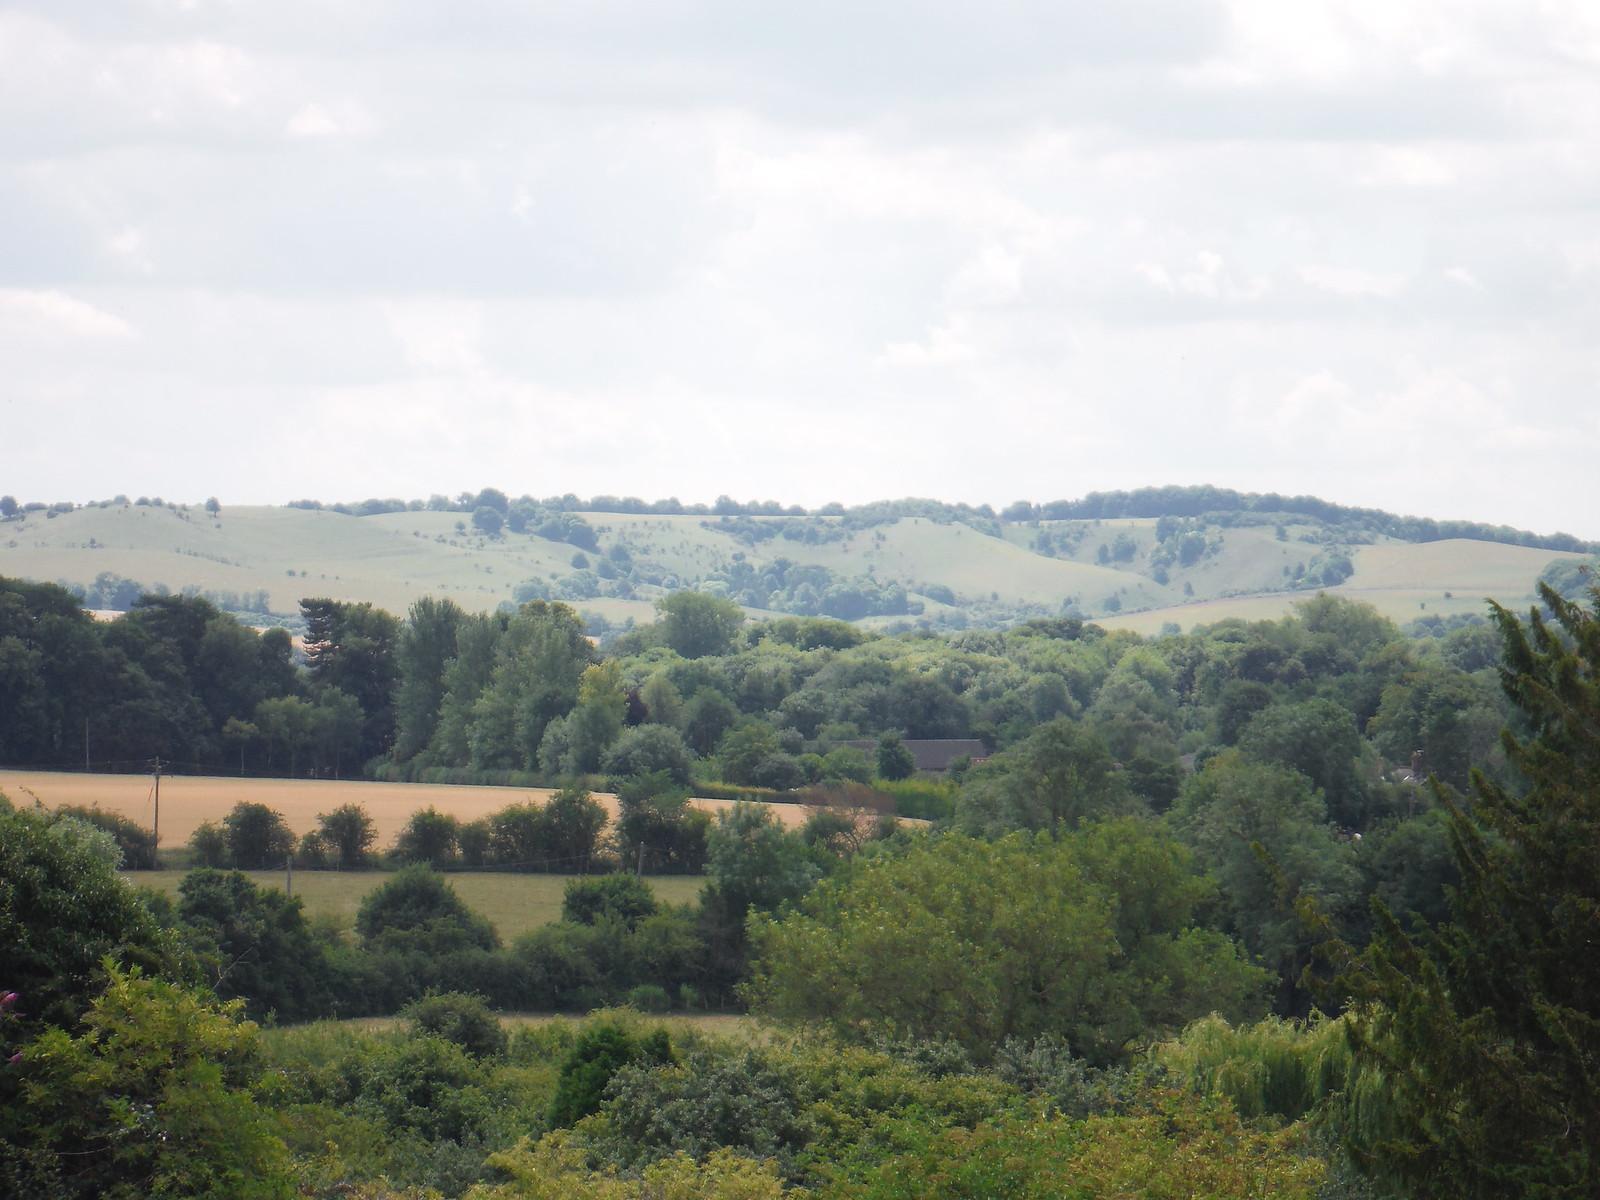 Barton Hills SWC Walk 233 - Arlesey to Letchworth Garden City